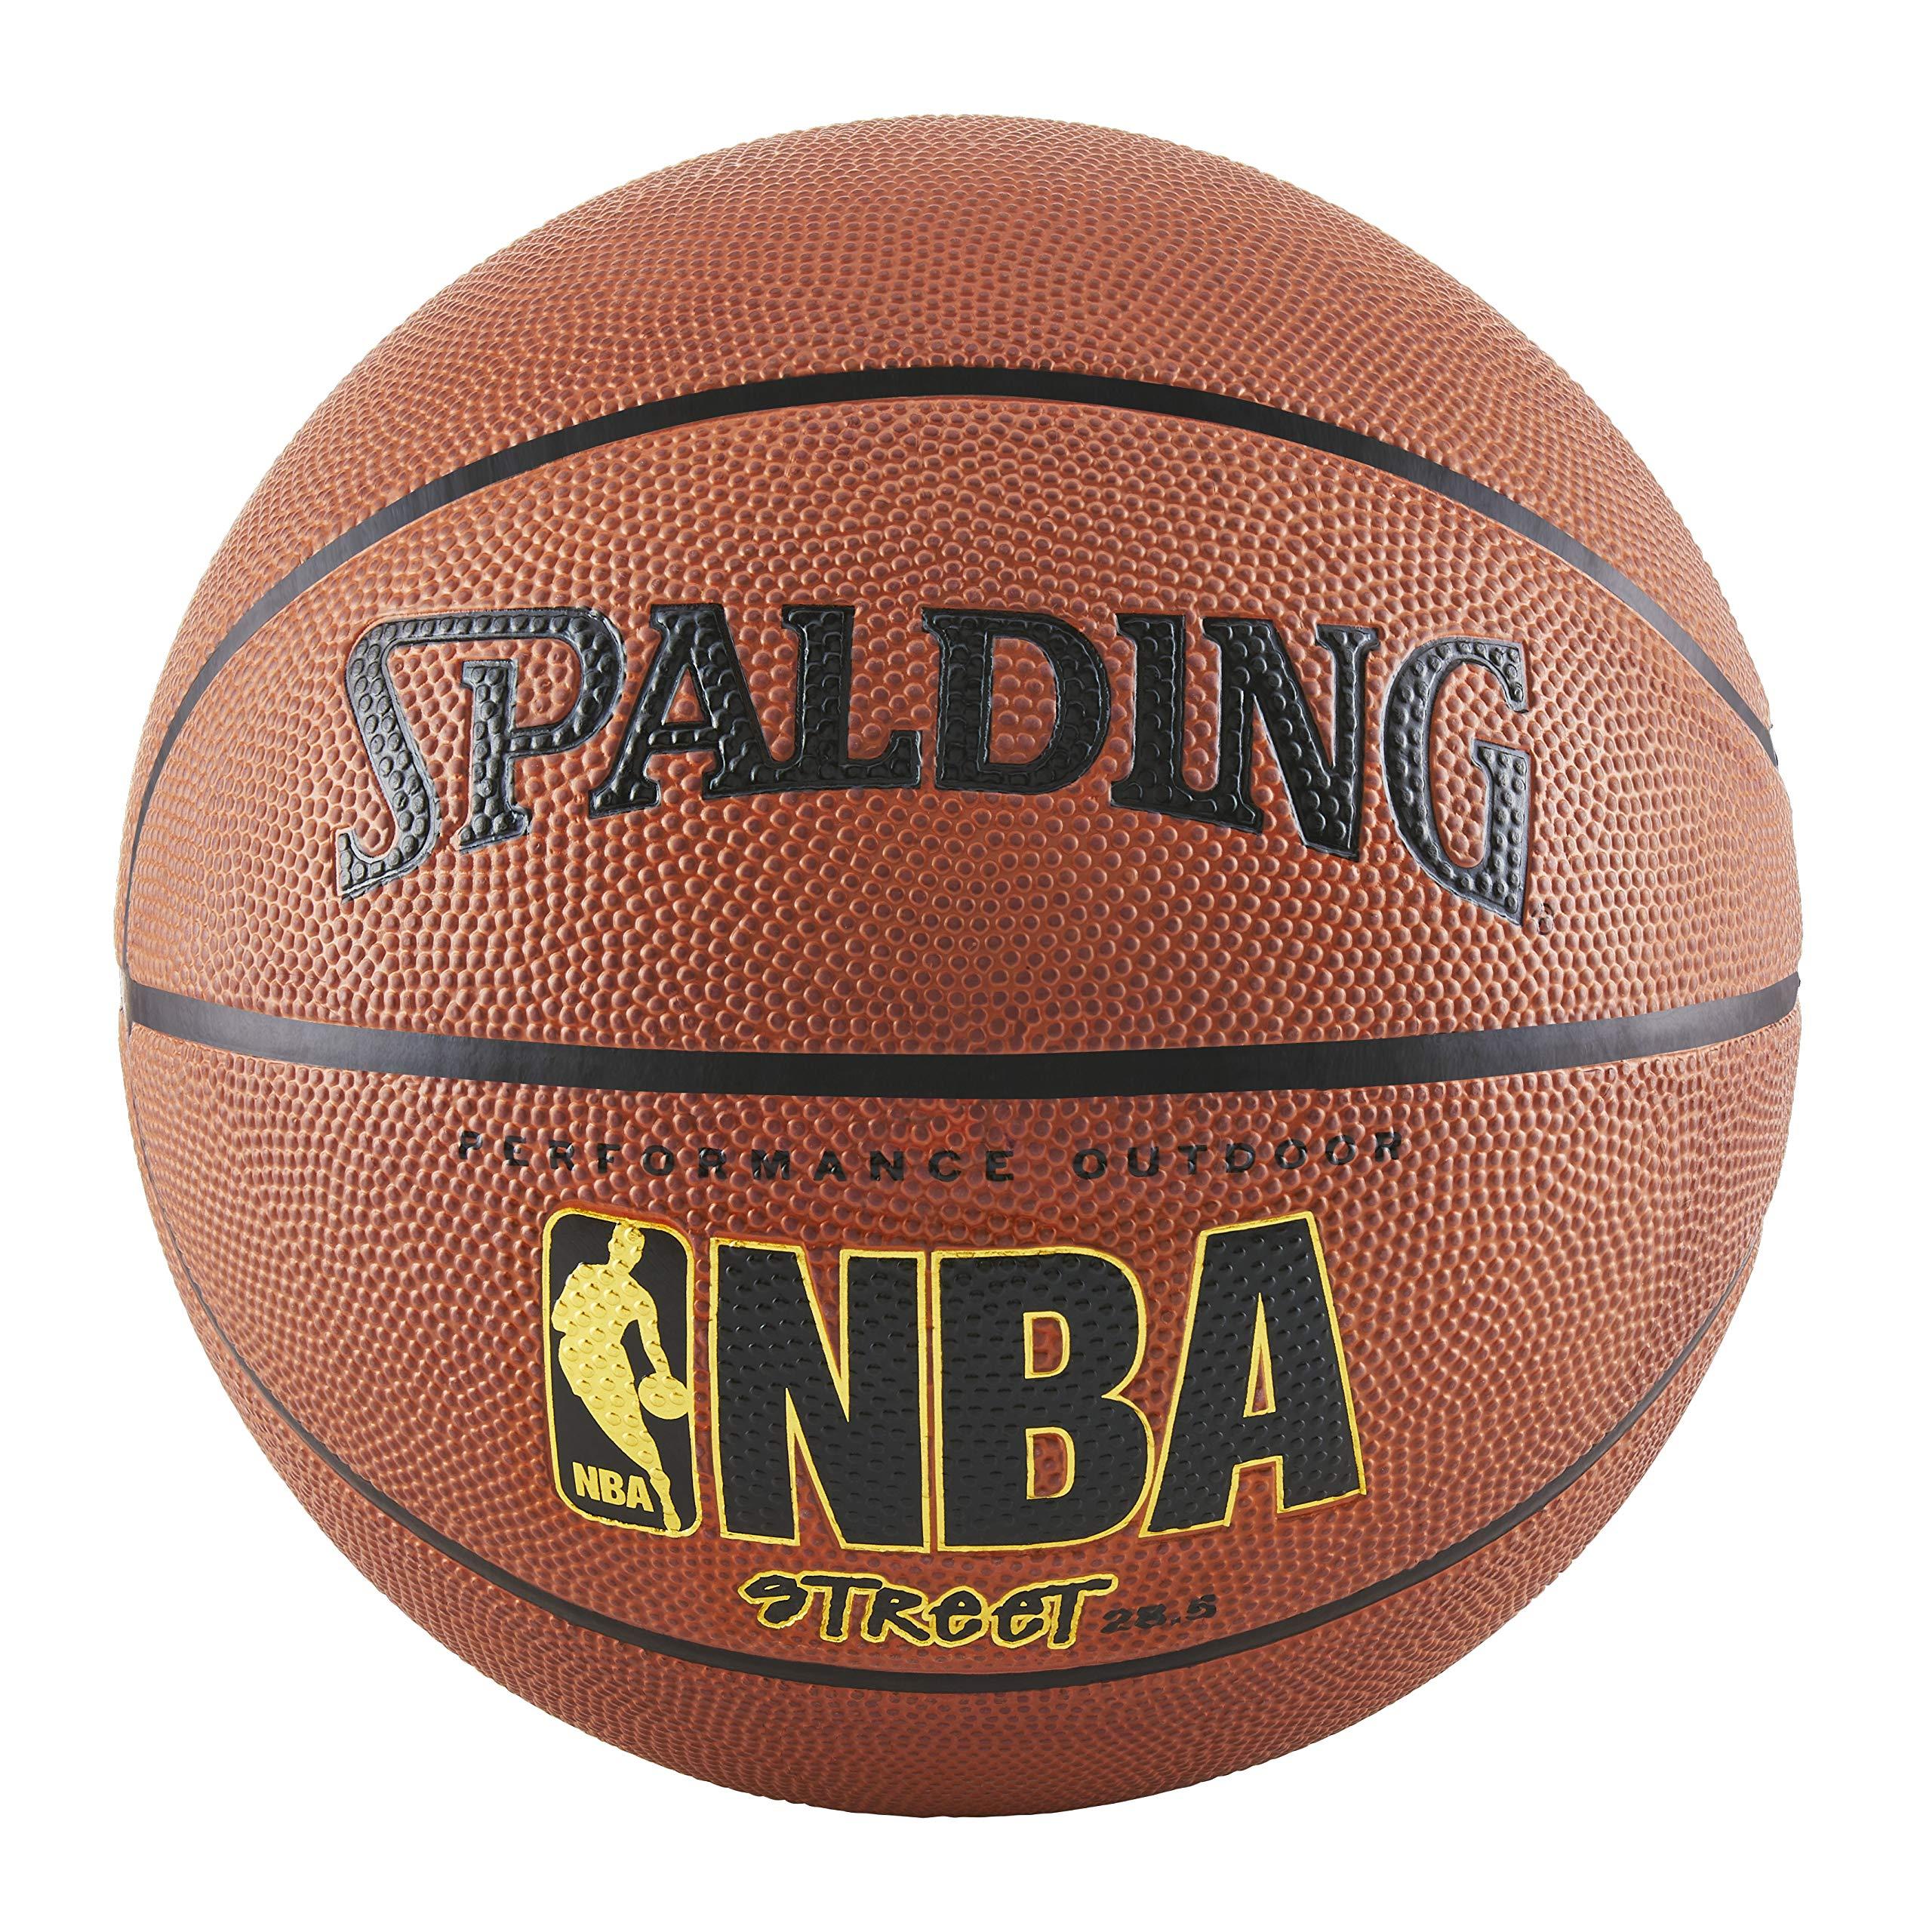 Spalding NBA Street Basketball - Intermediate Size 6 (28.5'')